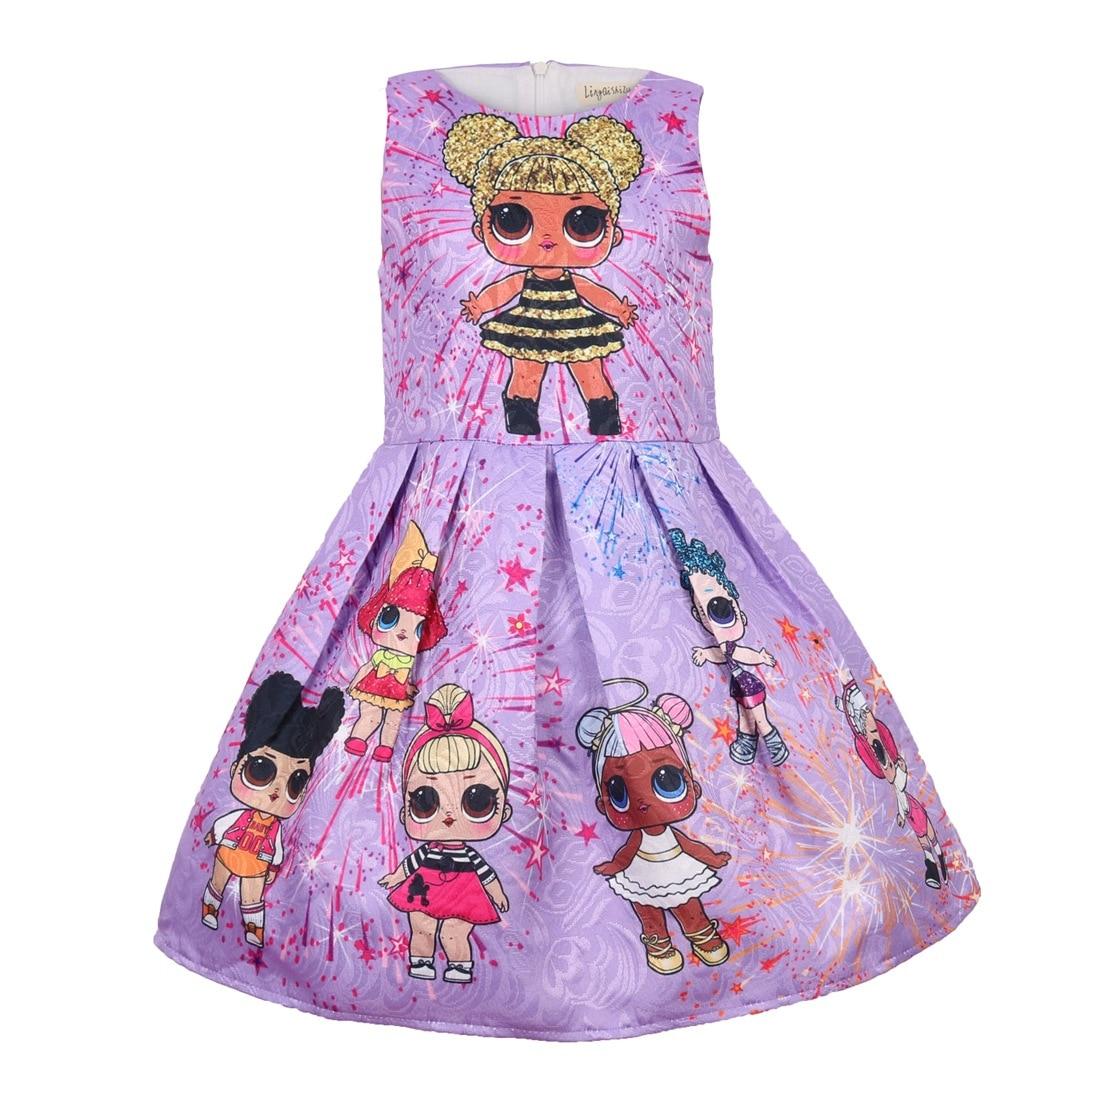 Lol Dolls Baby Dresses 3-9Y Summer Cute Elegant Dress Kids Party Christmas Costumes Children Clothes Princess Lol Girls Dress fashion christmas dress girls party accessories children s halloween costumes for girls party dress kids cute birthday dresses